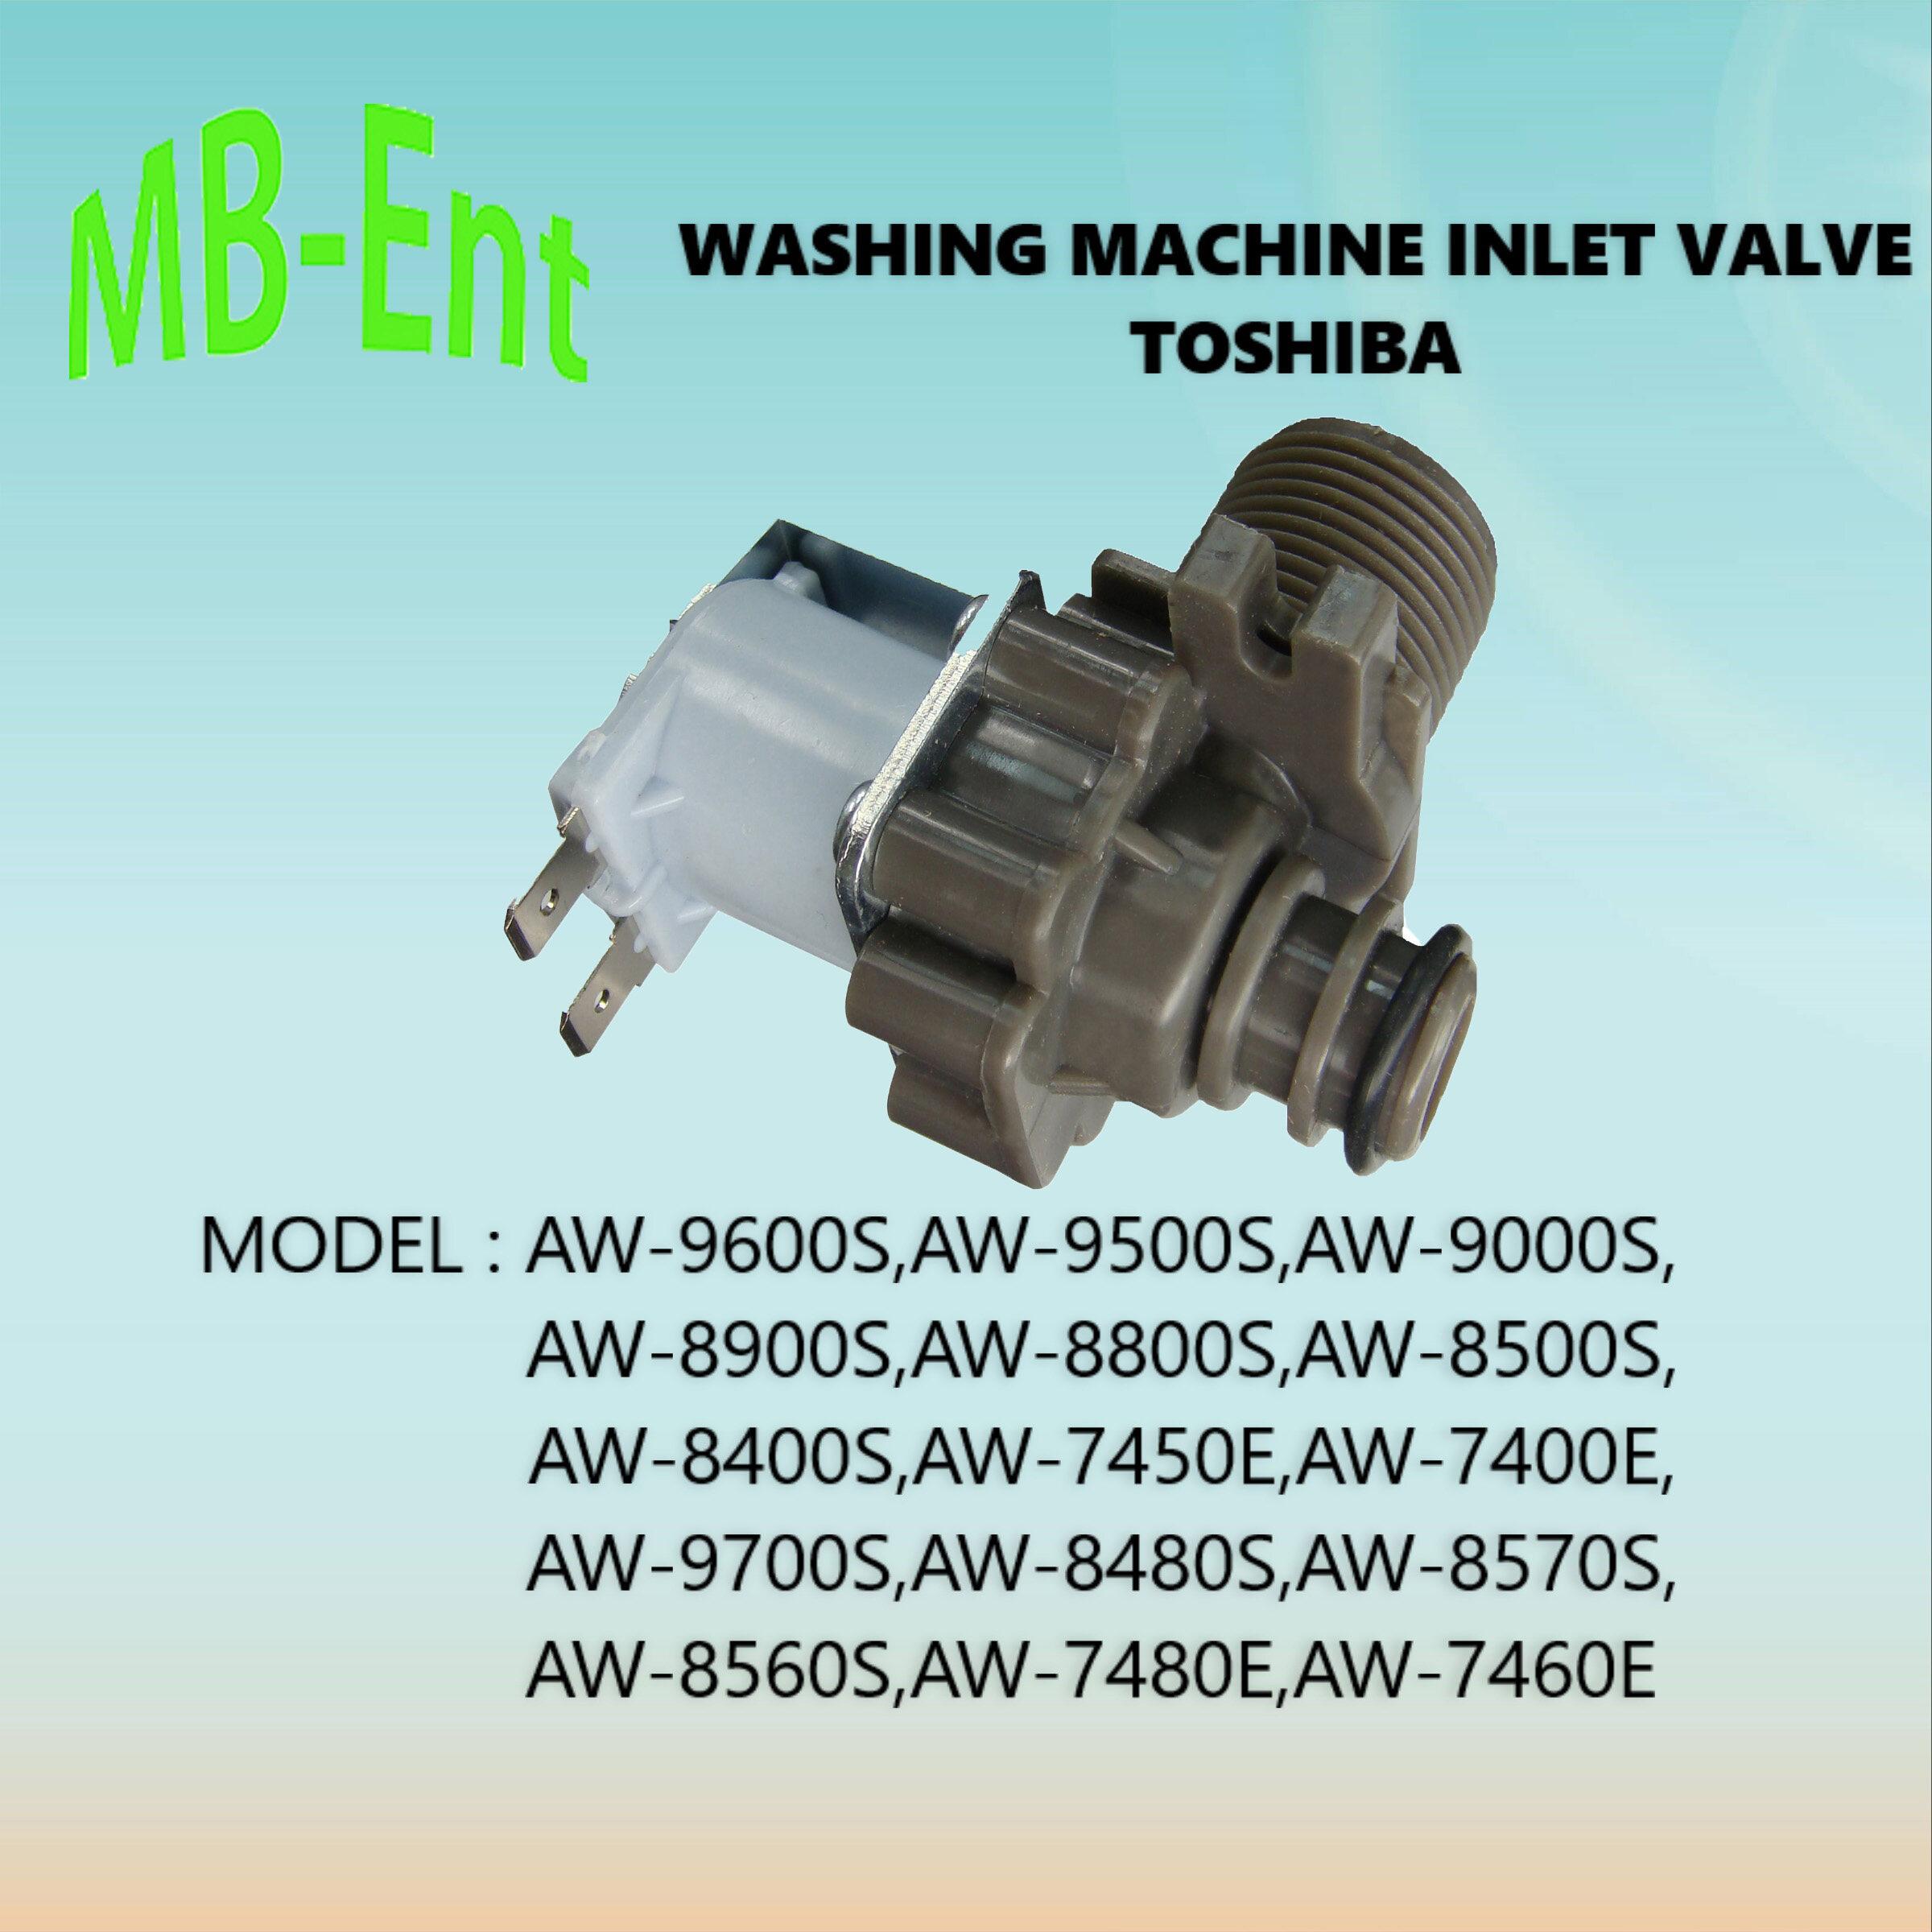 MY BAJET ELEKTRONIK INLET VALVE TOSHIBA AW-9600S